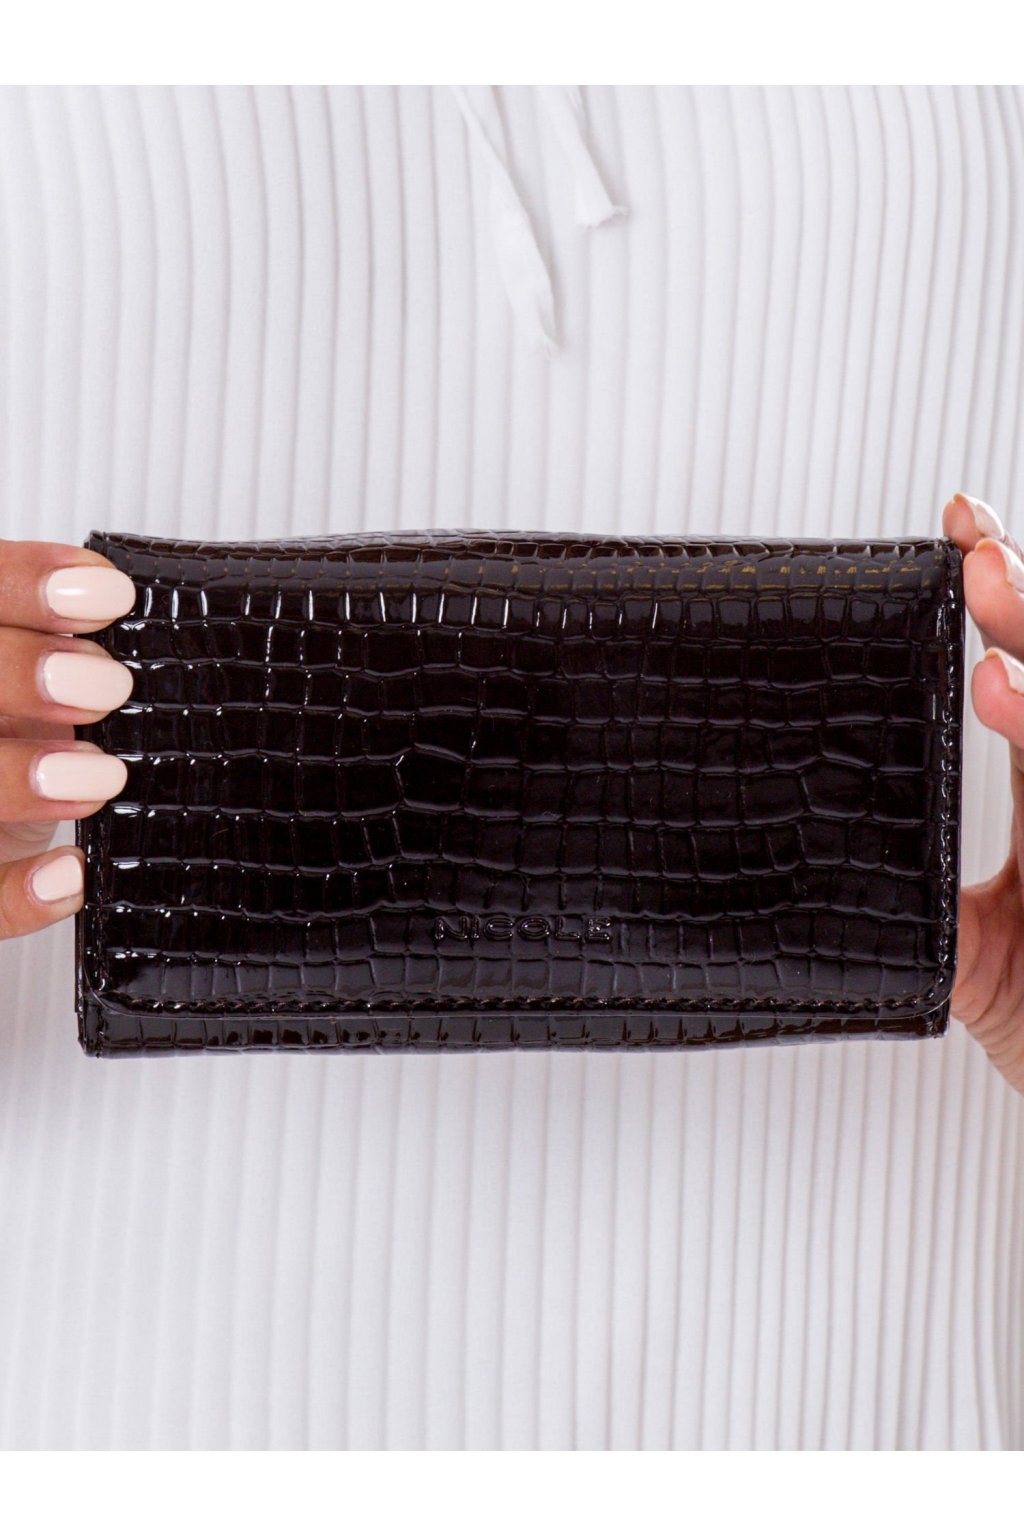 Peňaženka kód G113-1627